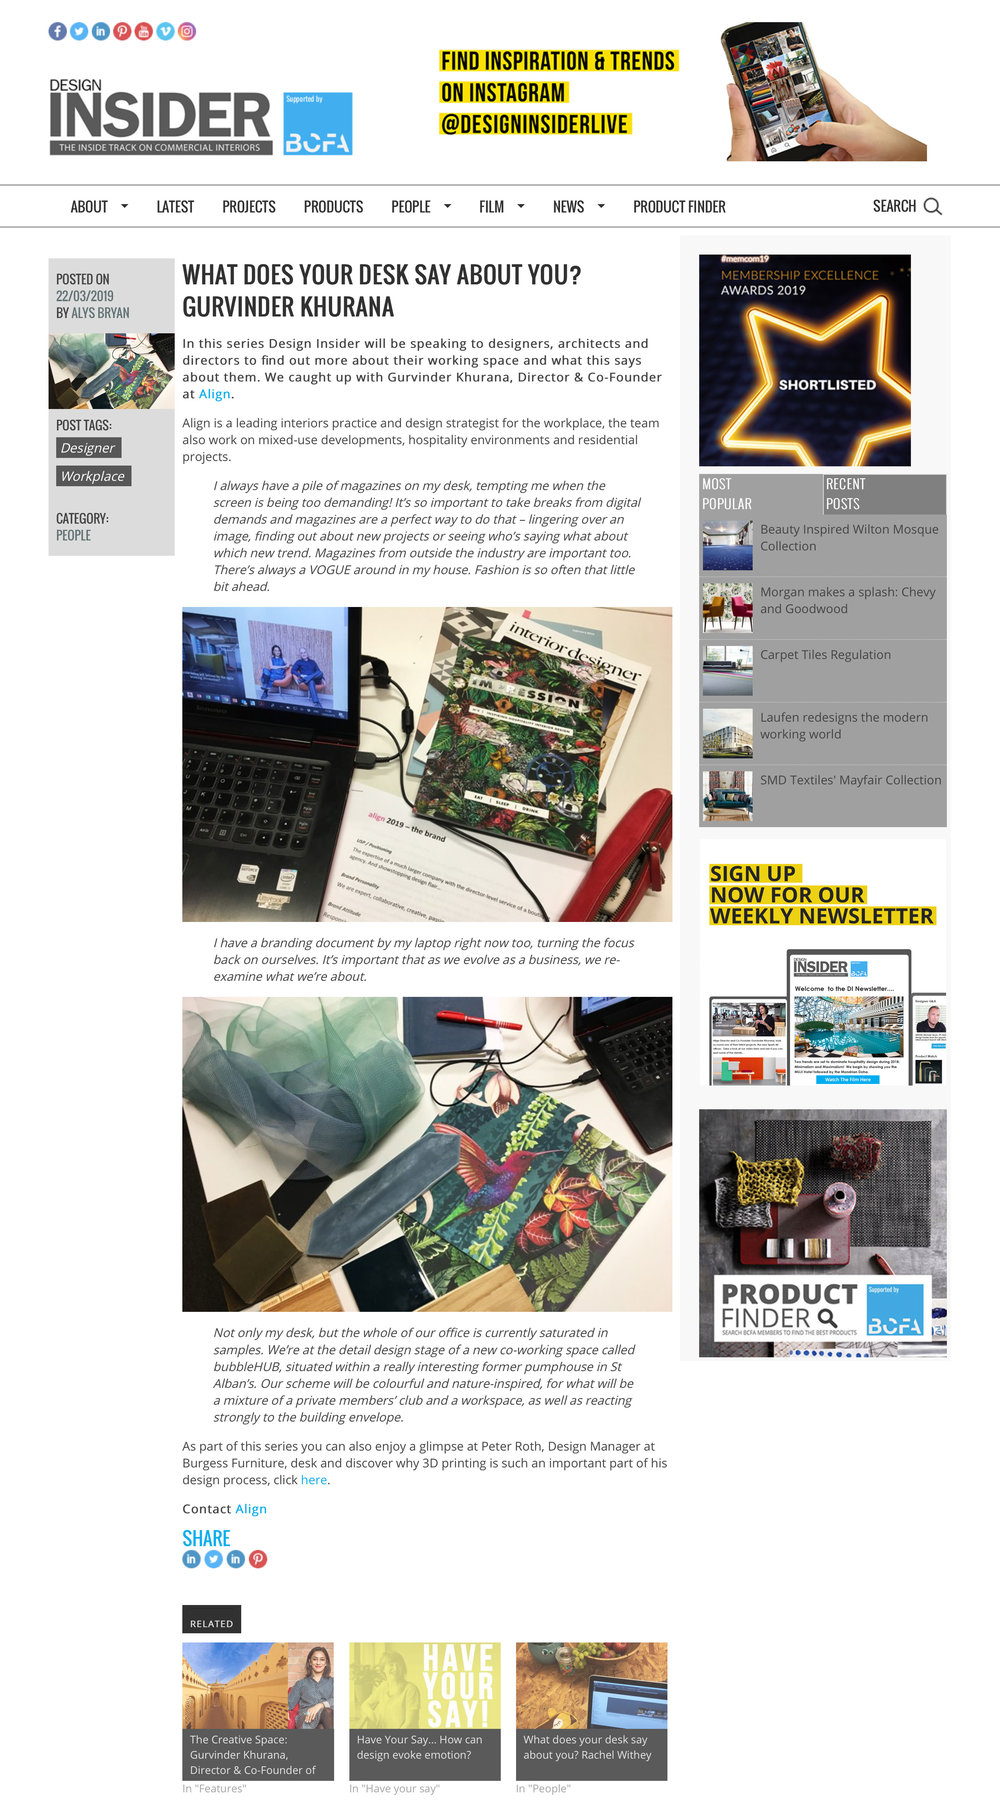 design-insider-gurvinda-desk-press.jpg